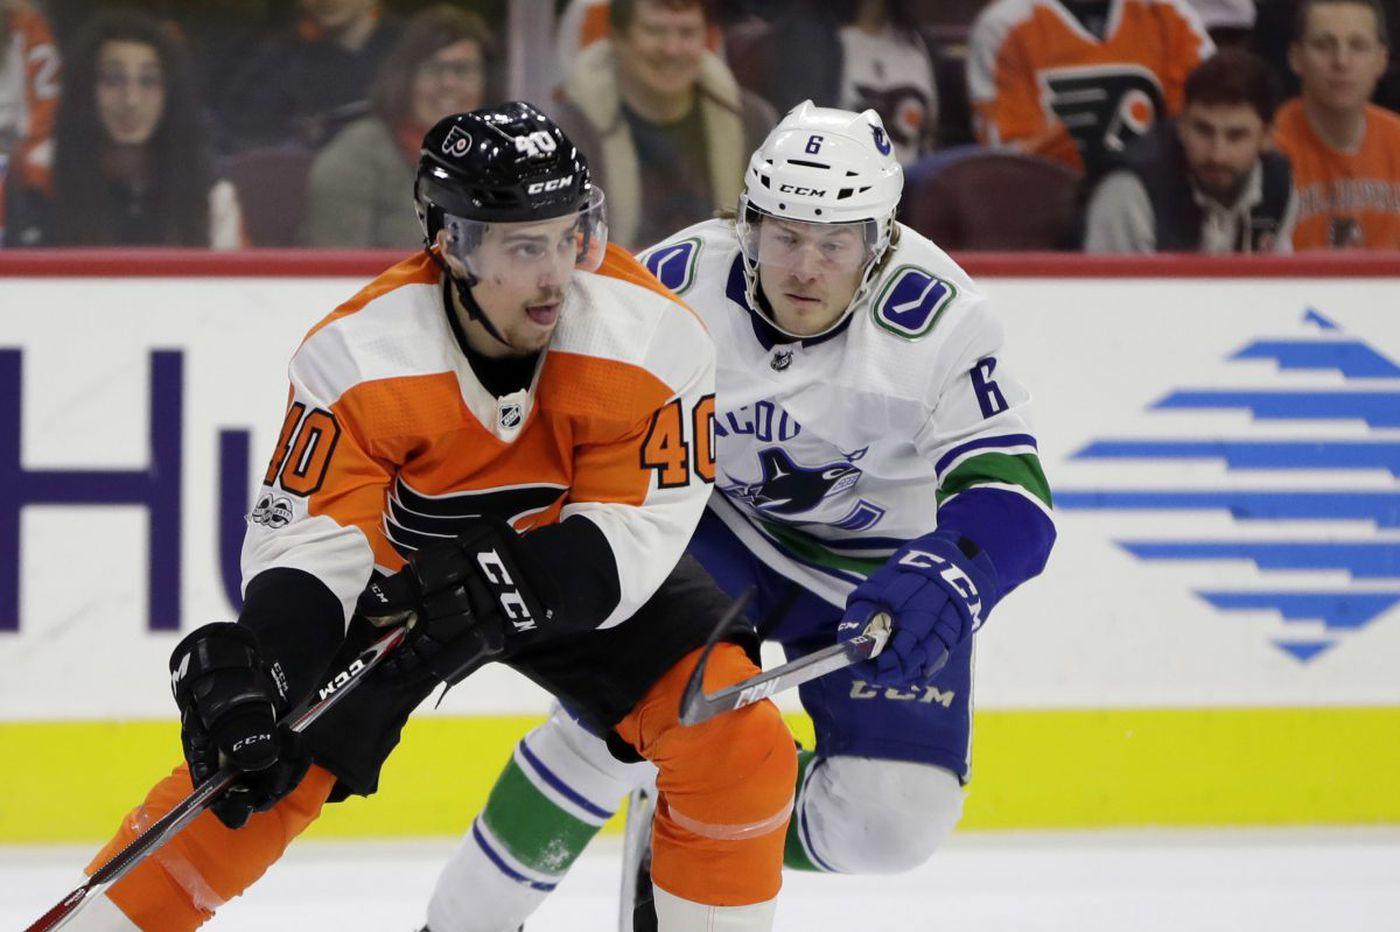 Jordan Weal, hitting 'restart button,' will replace Danick Martel in Flyers lineup